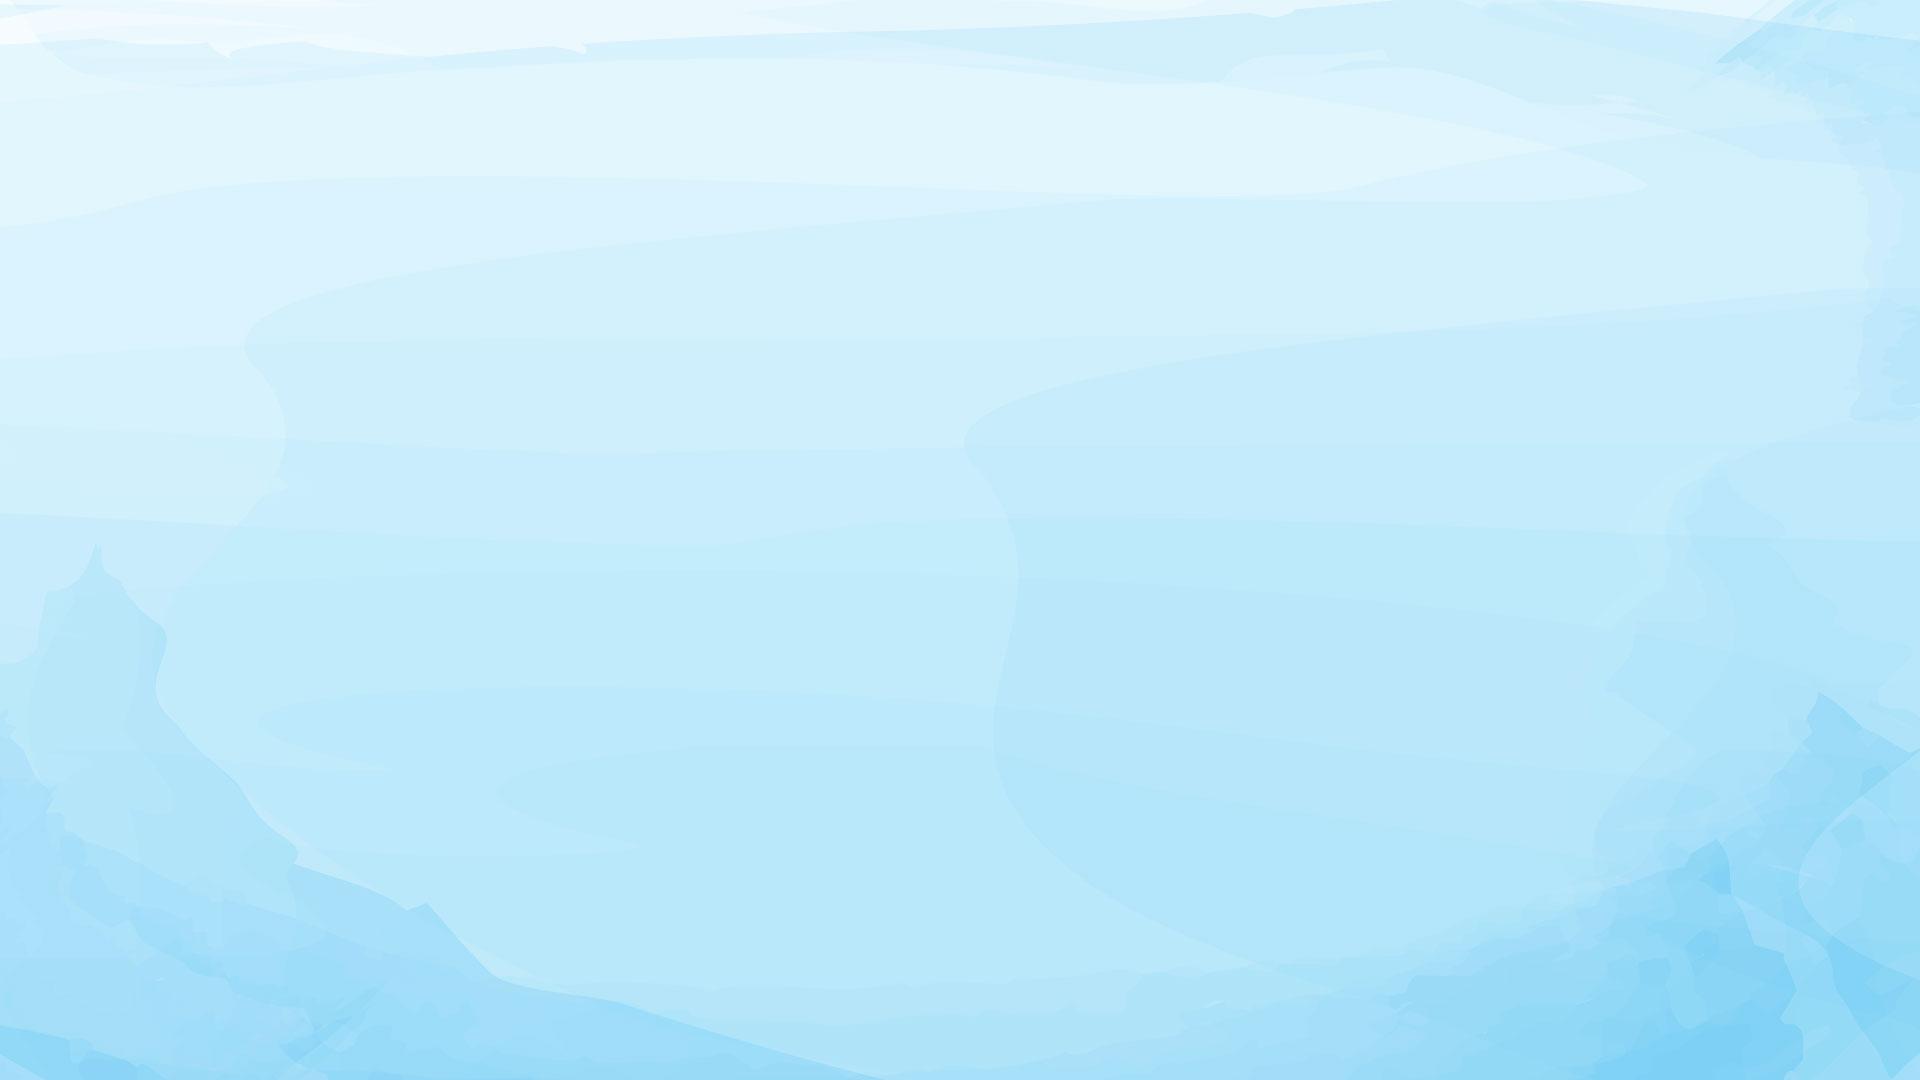 Kumpulan Background Efek Cat Air Biru - Mas Vian